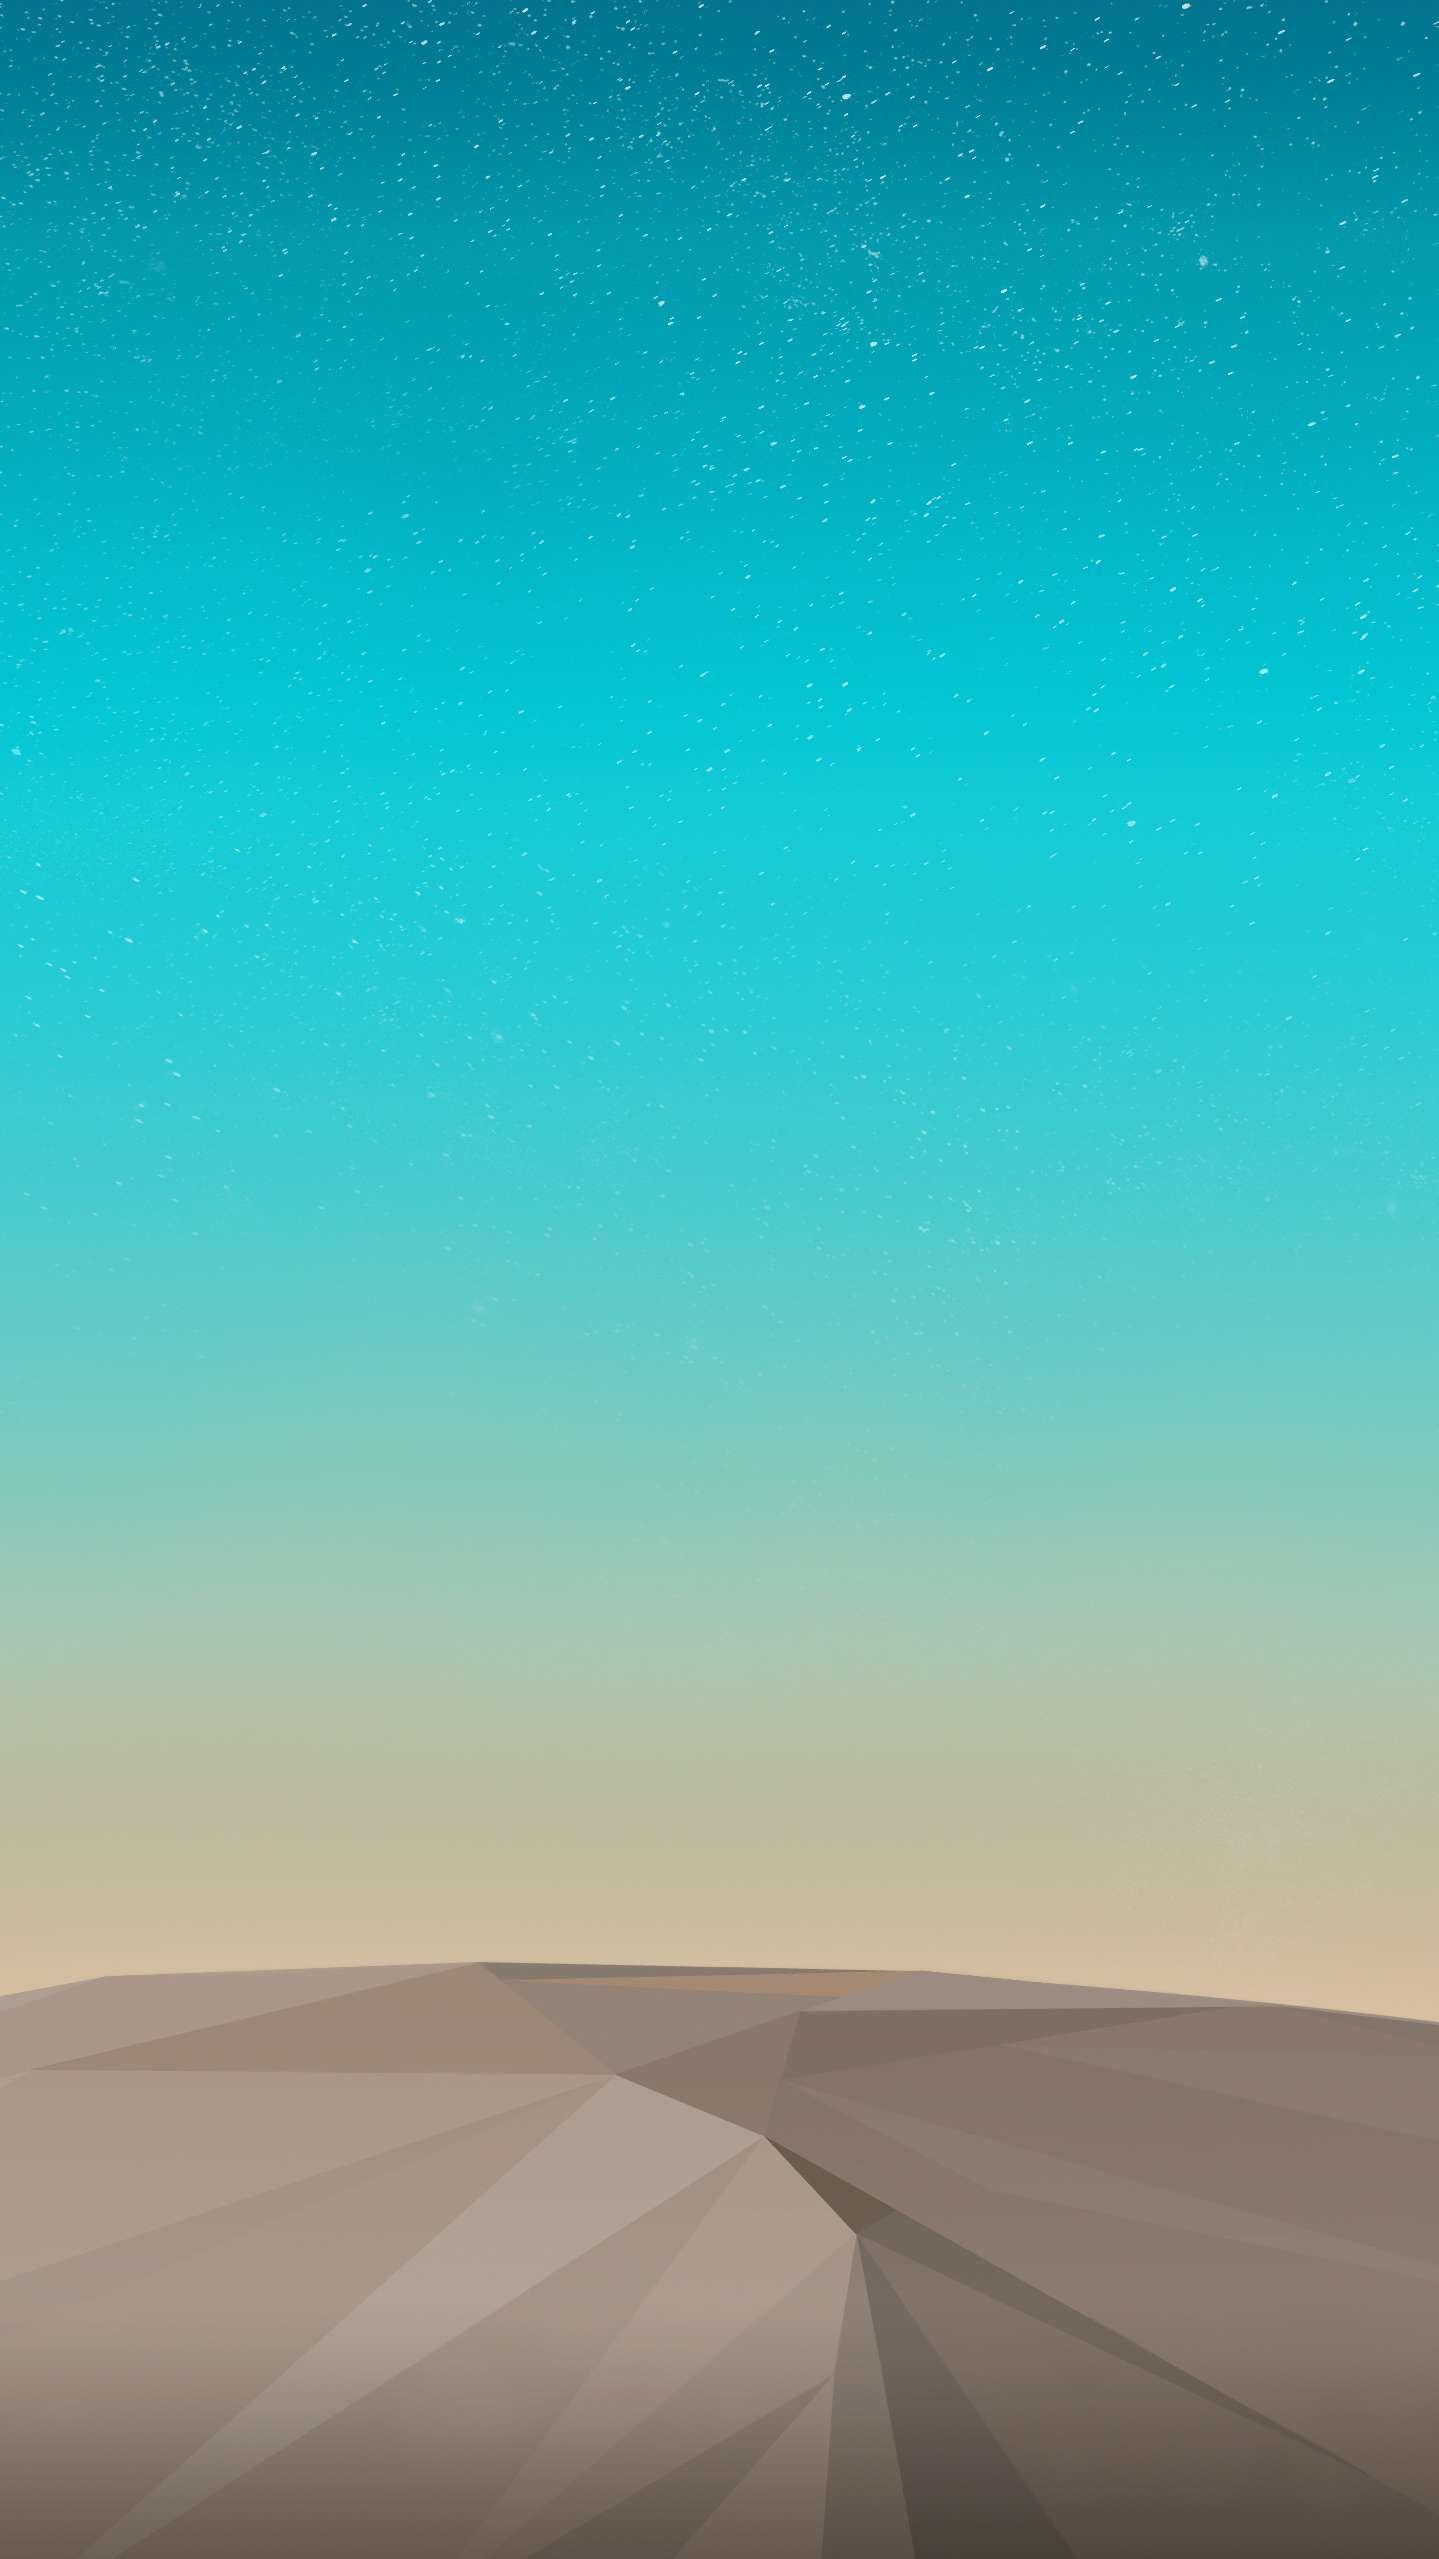 Sky Stars and Desert iPhone Wallpaper